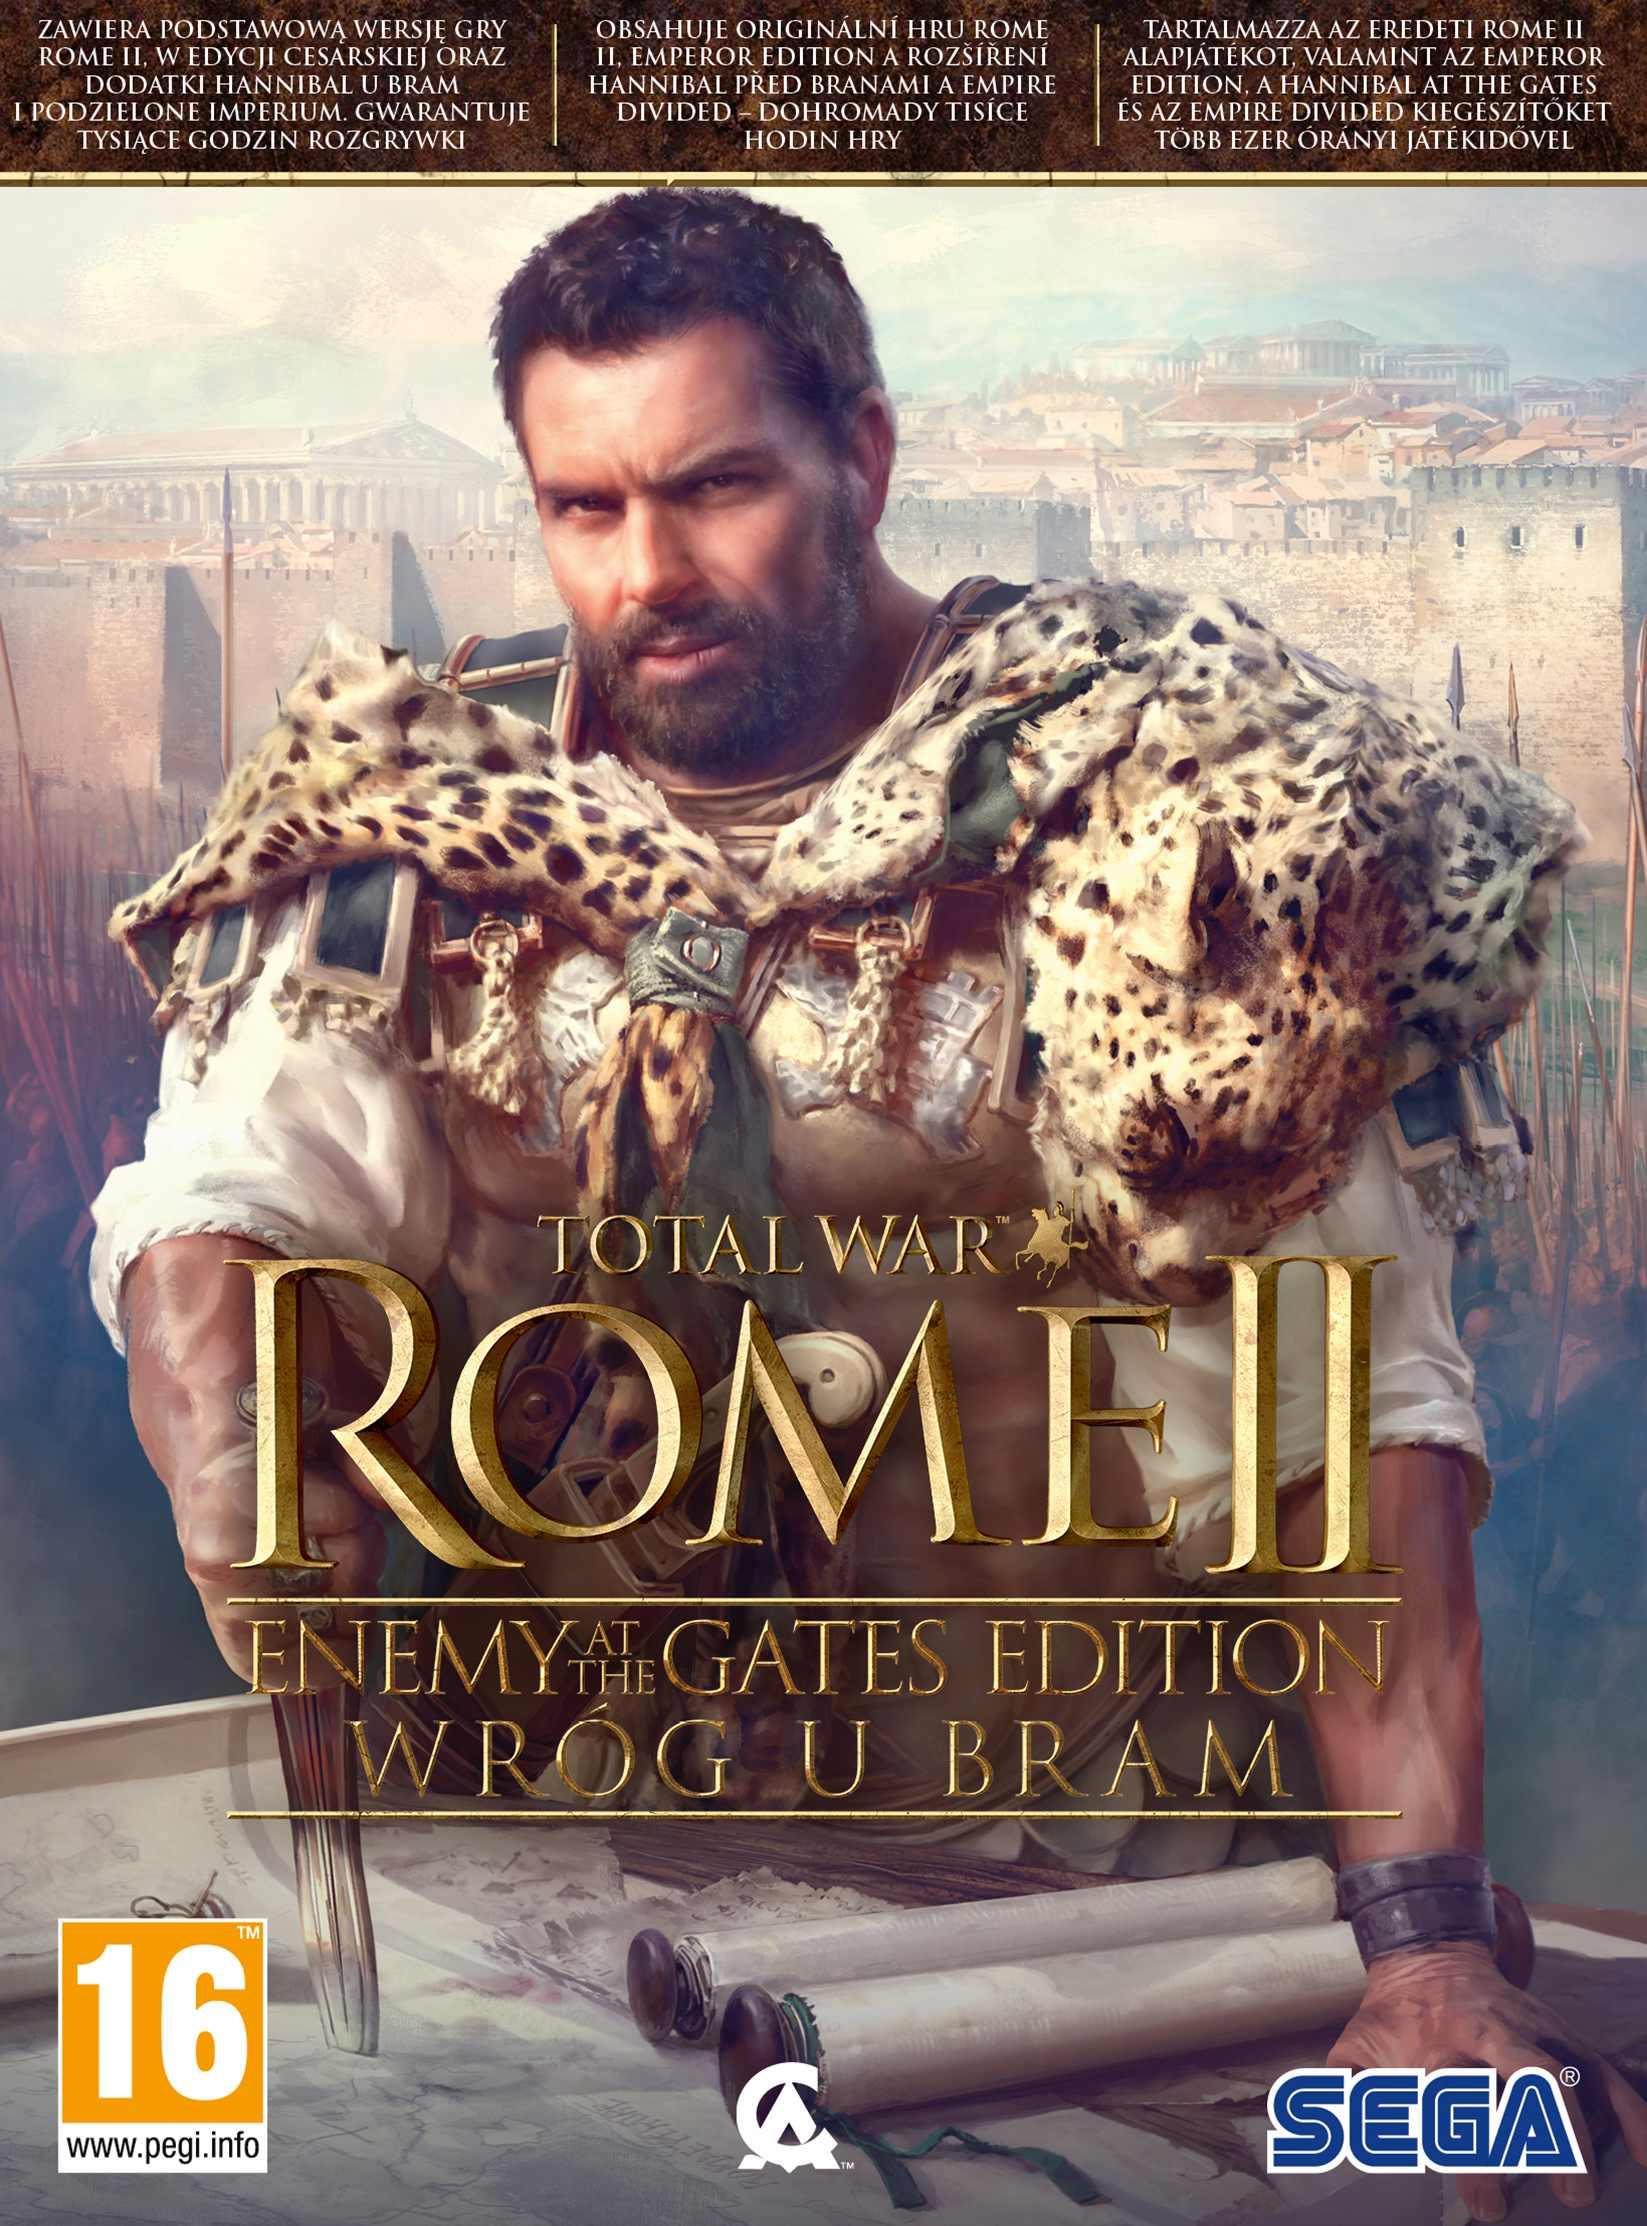 Total War: Rome 2 - Enemy at the Gates Edition Wróg u bram (PC) PL